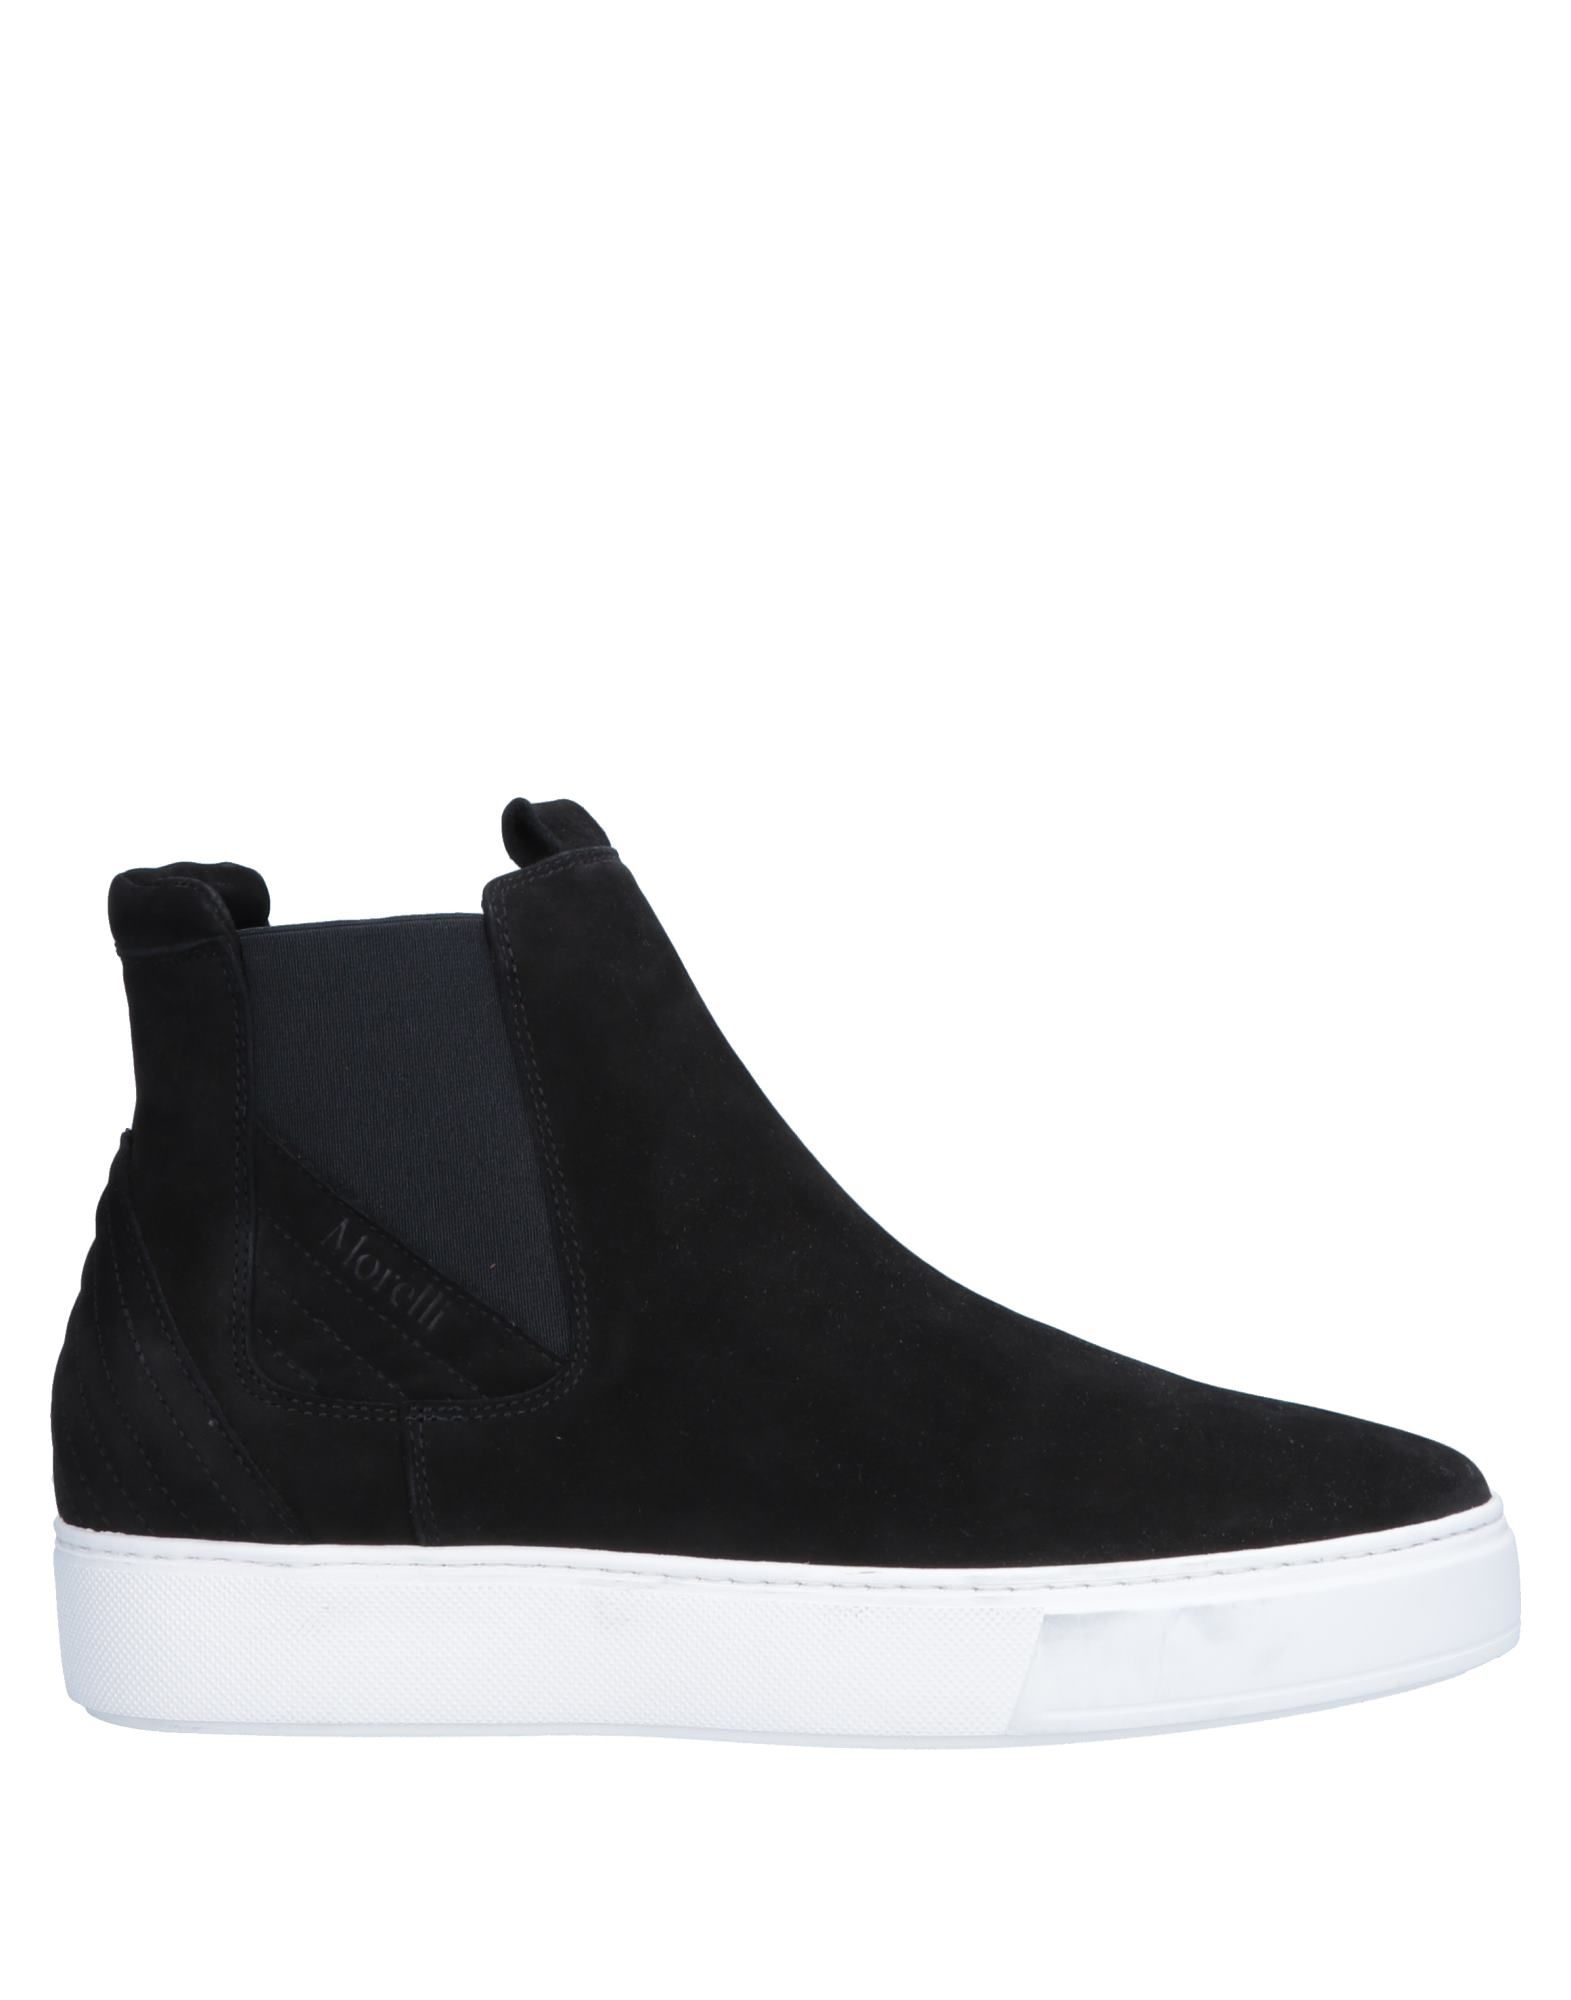 Andrea Morelli Sneakers - Men Andrea Morelli Sneakers - online on  Canada - Sneakers 11560233FR 88c64e